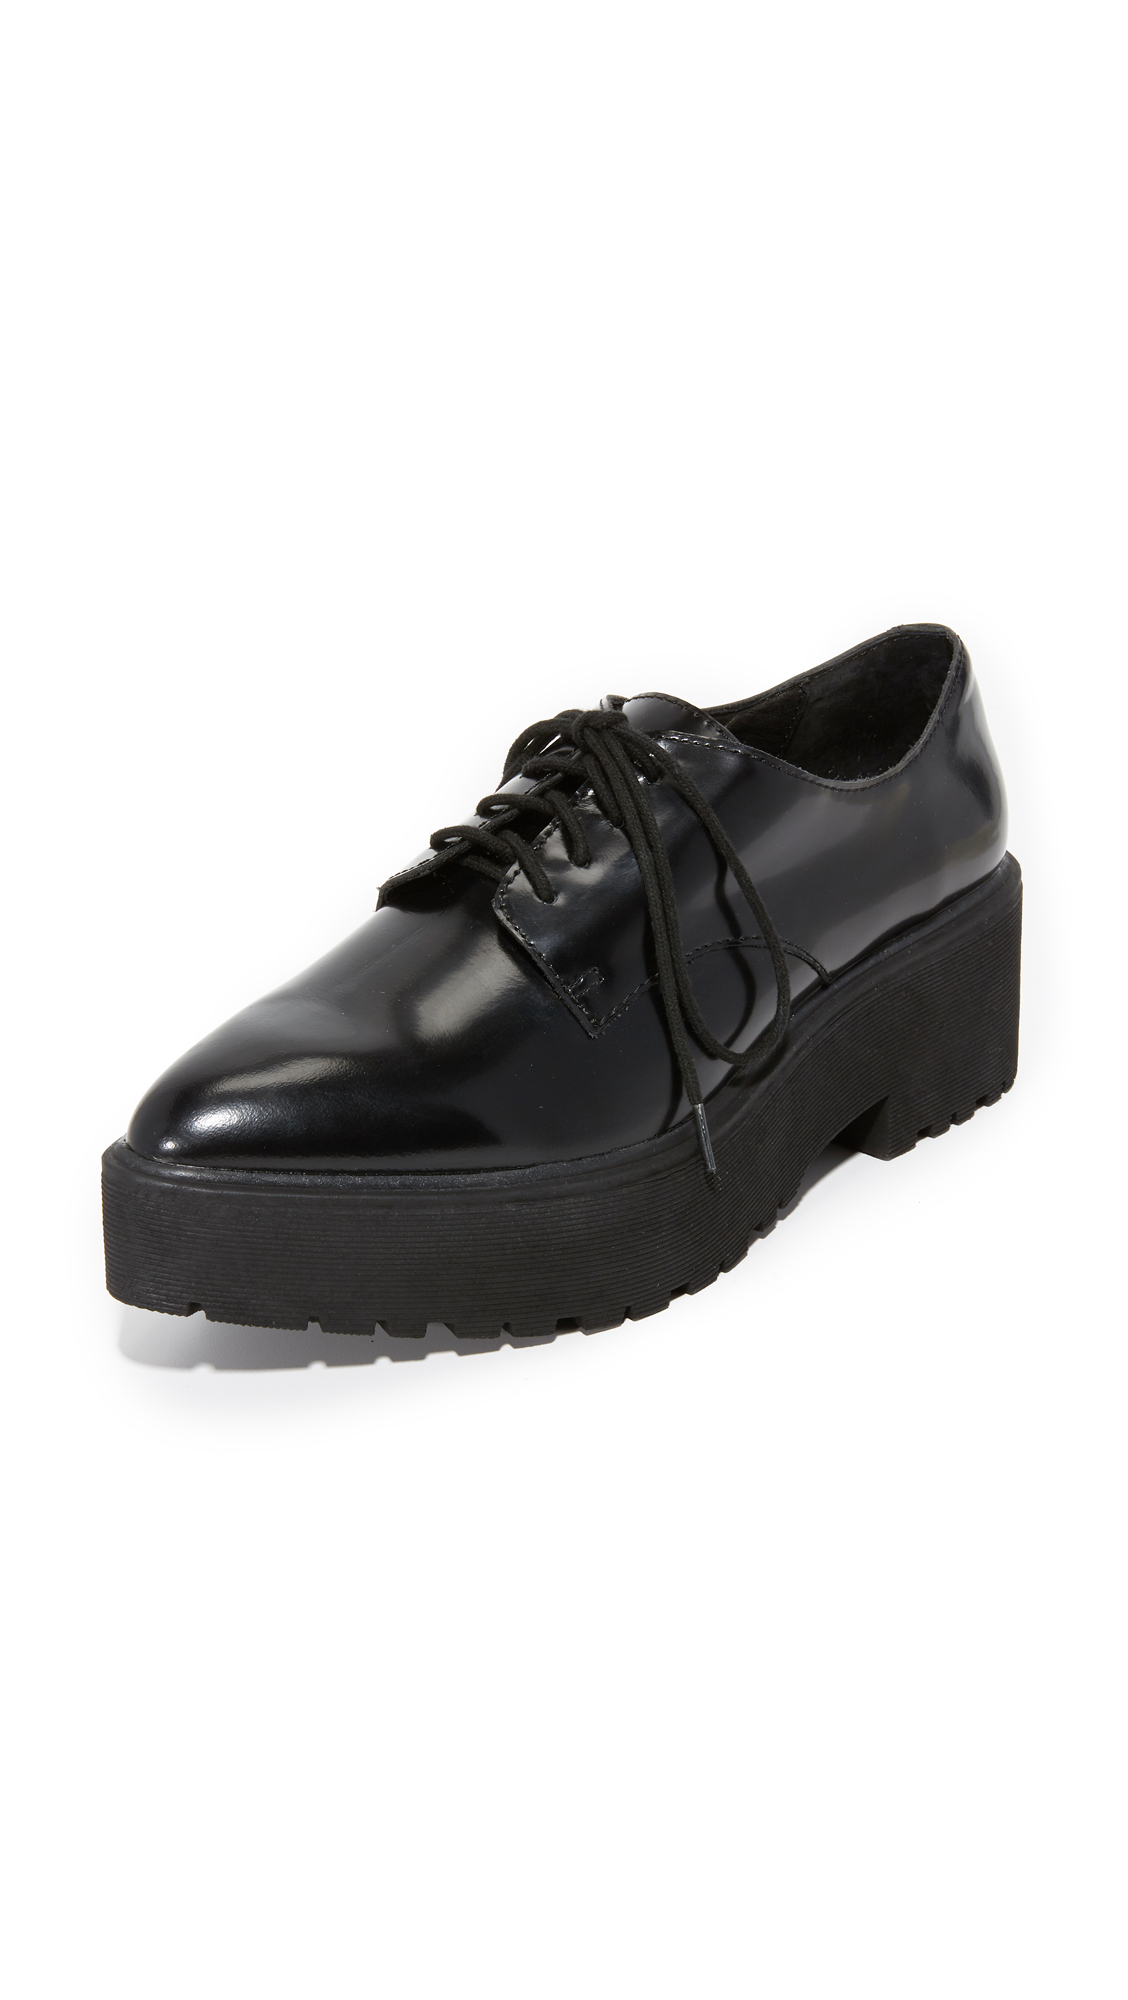 Jeffrey Campbell Bardem Platform Oxfords - Black Box at Shopbop